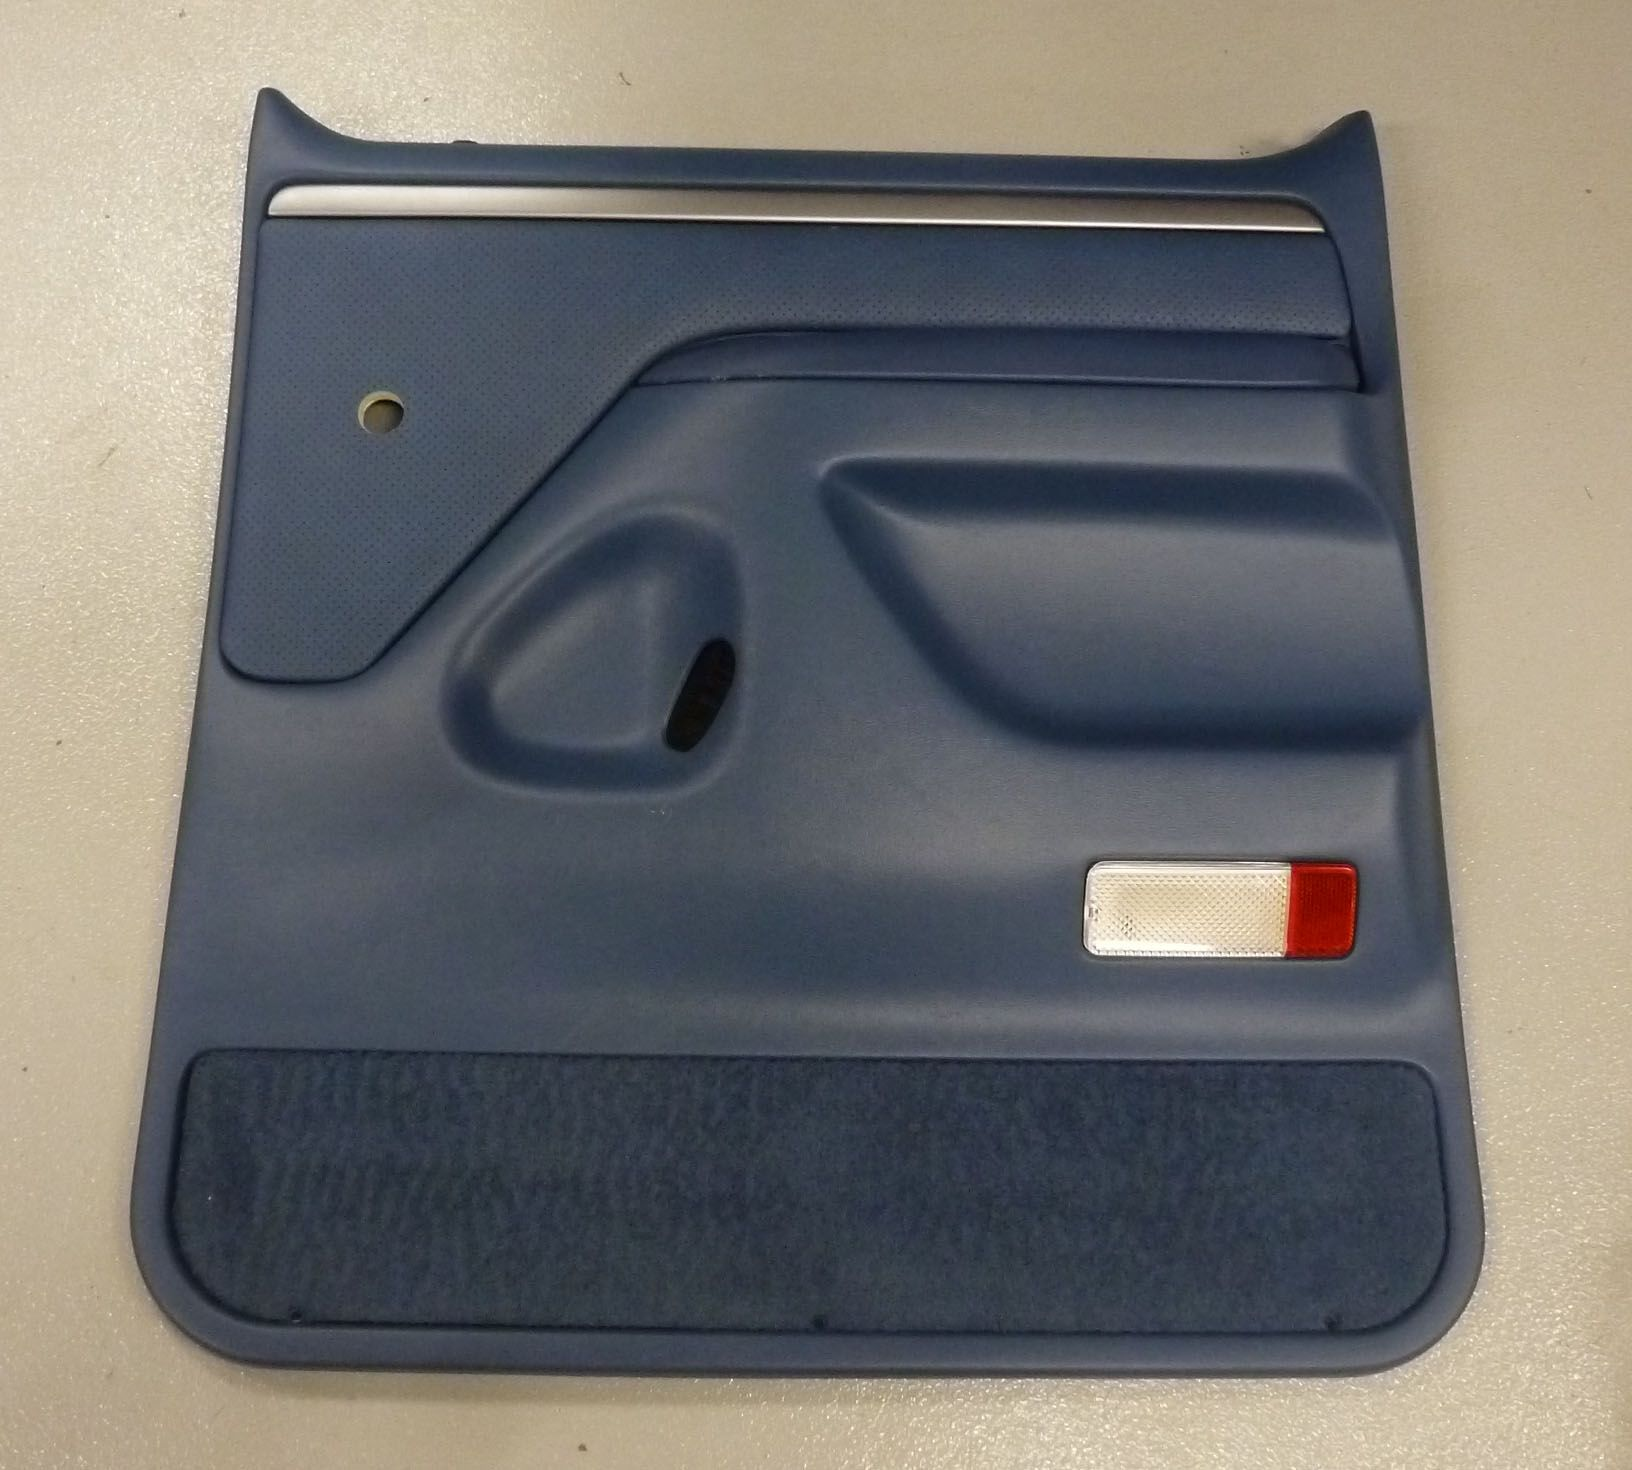 1992 1997 Ford F Series Truck Right Rear Door Panel Blue Manual Explorer Lock Schematic Window Locks Broncograveyardcom